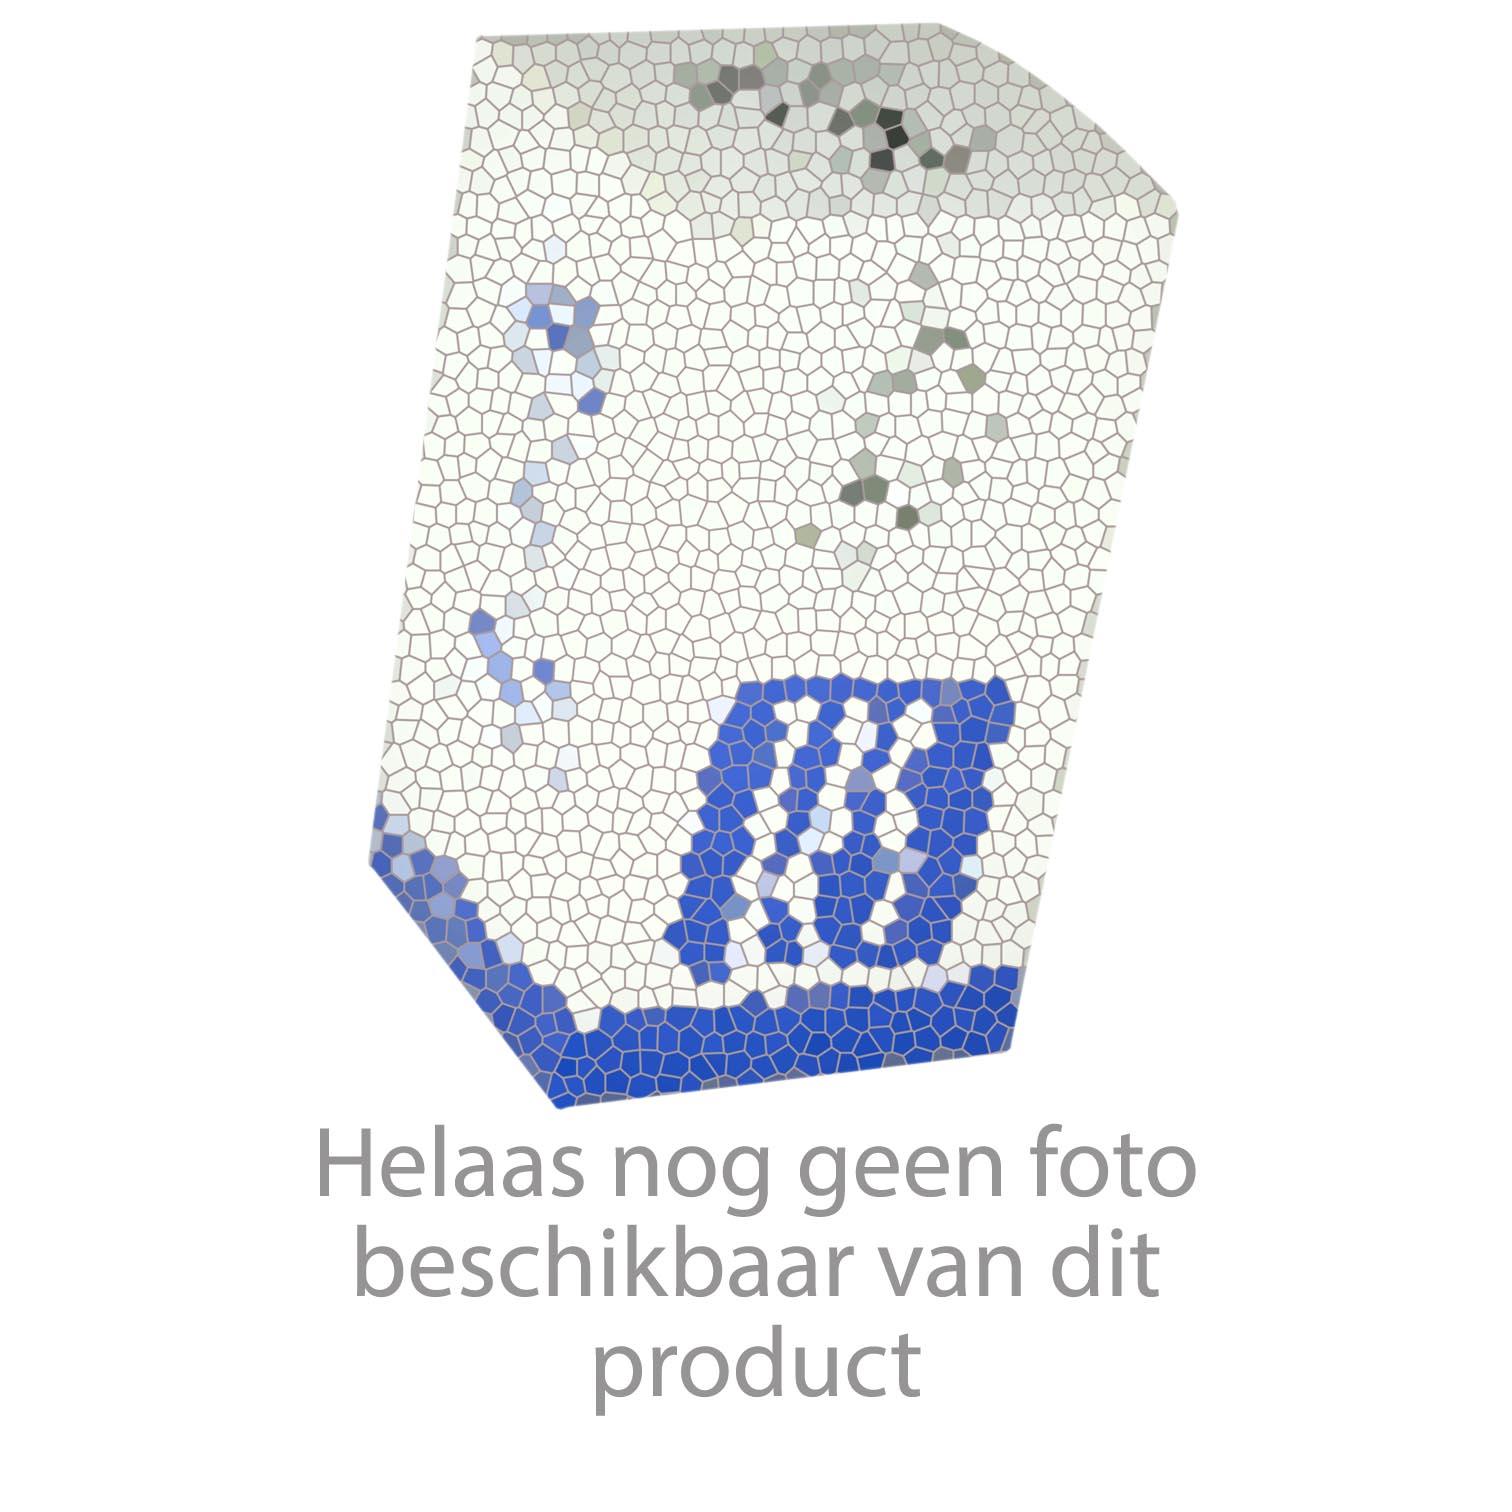 "Viega Overlooppijp gootsteenplug 6/4"" Waterstand 140mm chroom"